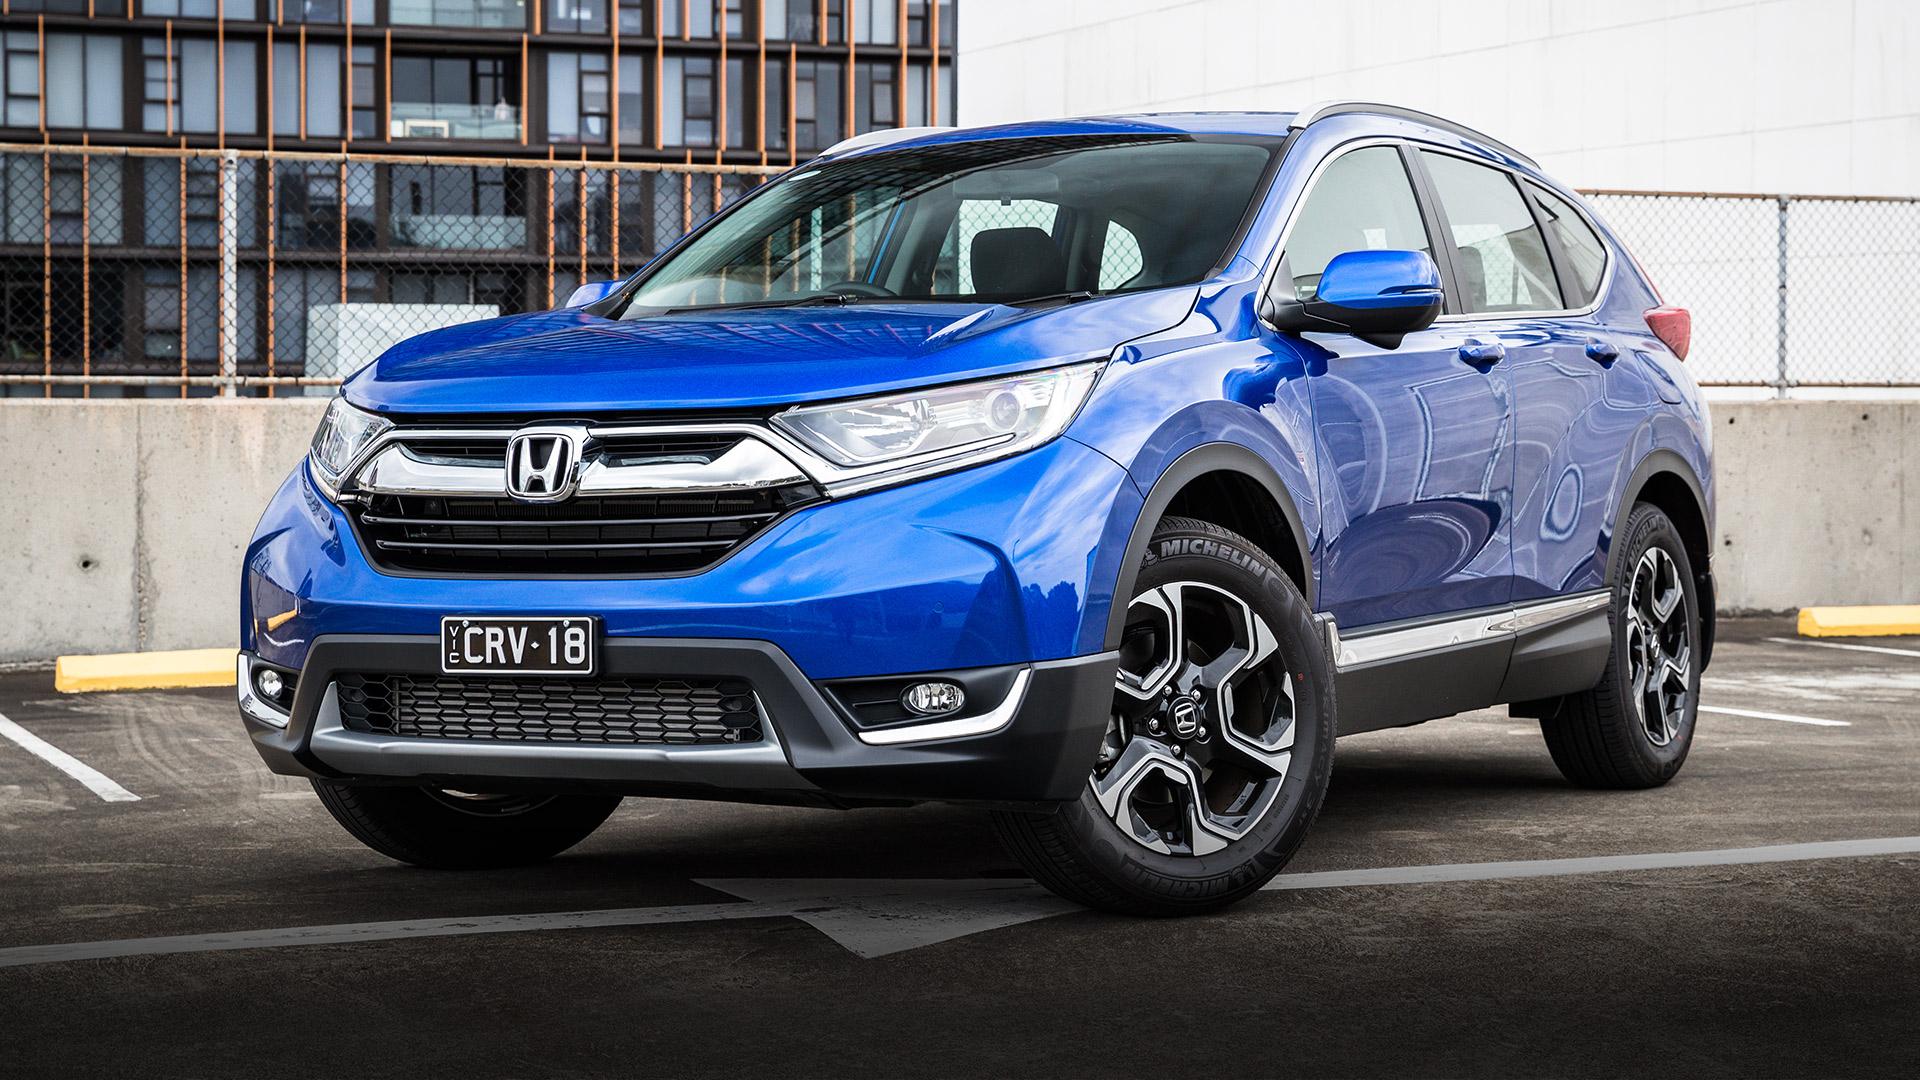 2019 Honda CR-V VTi-S long-termer: Introduction